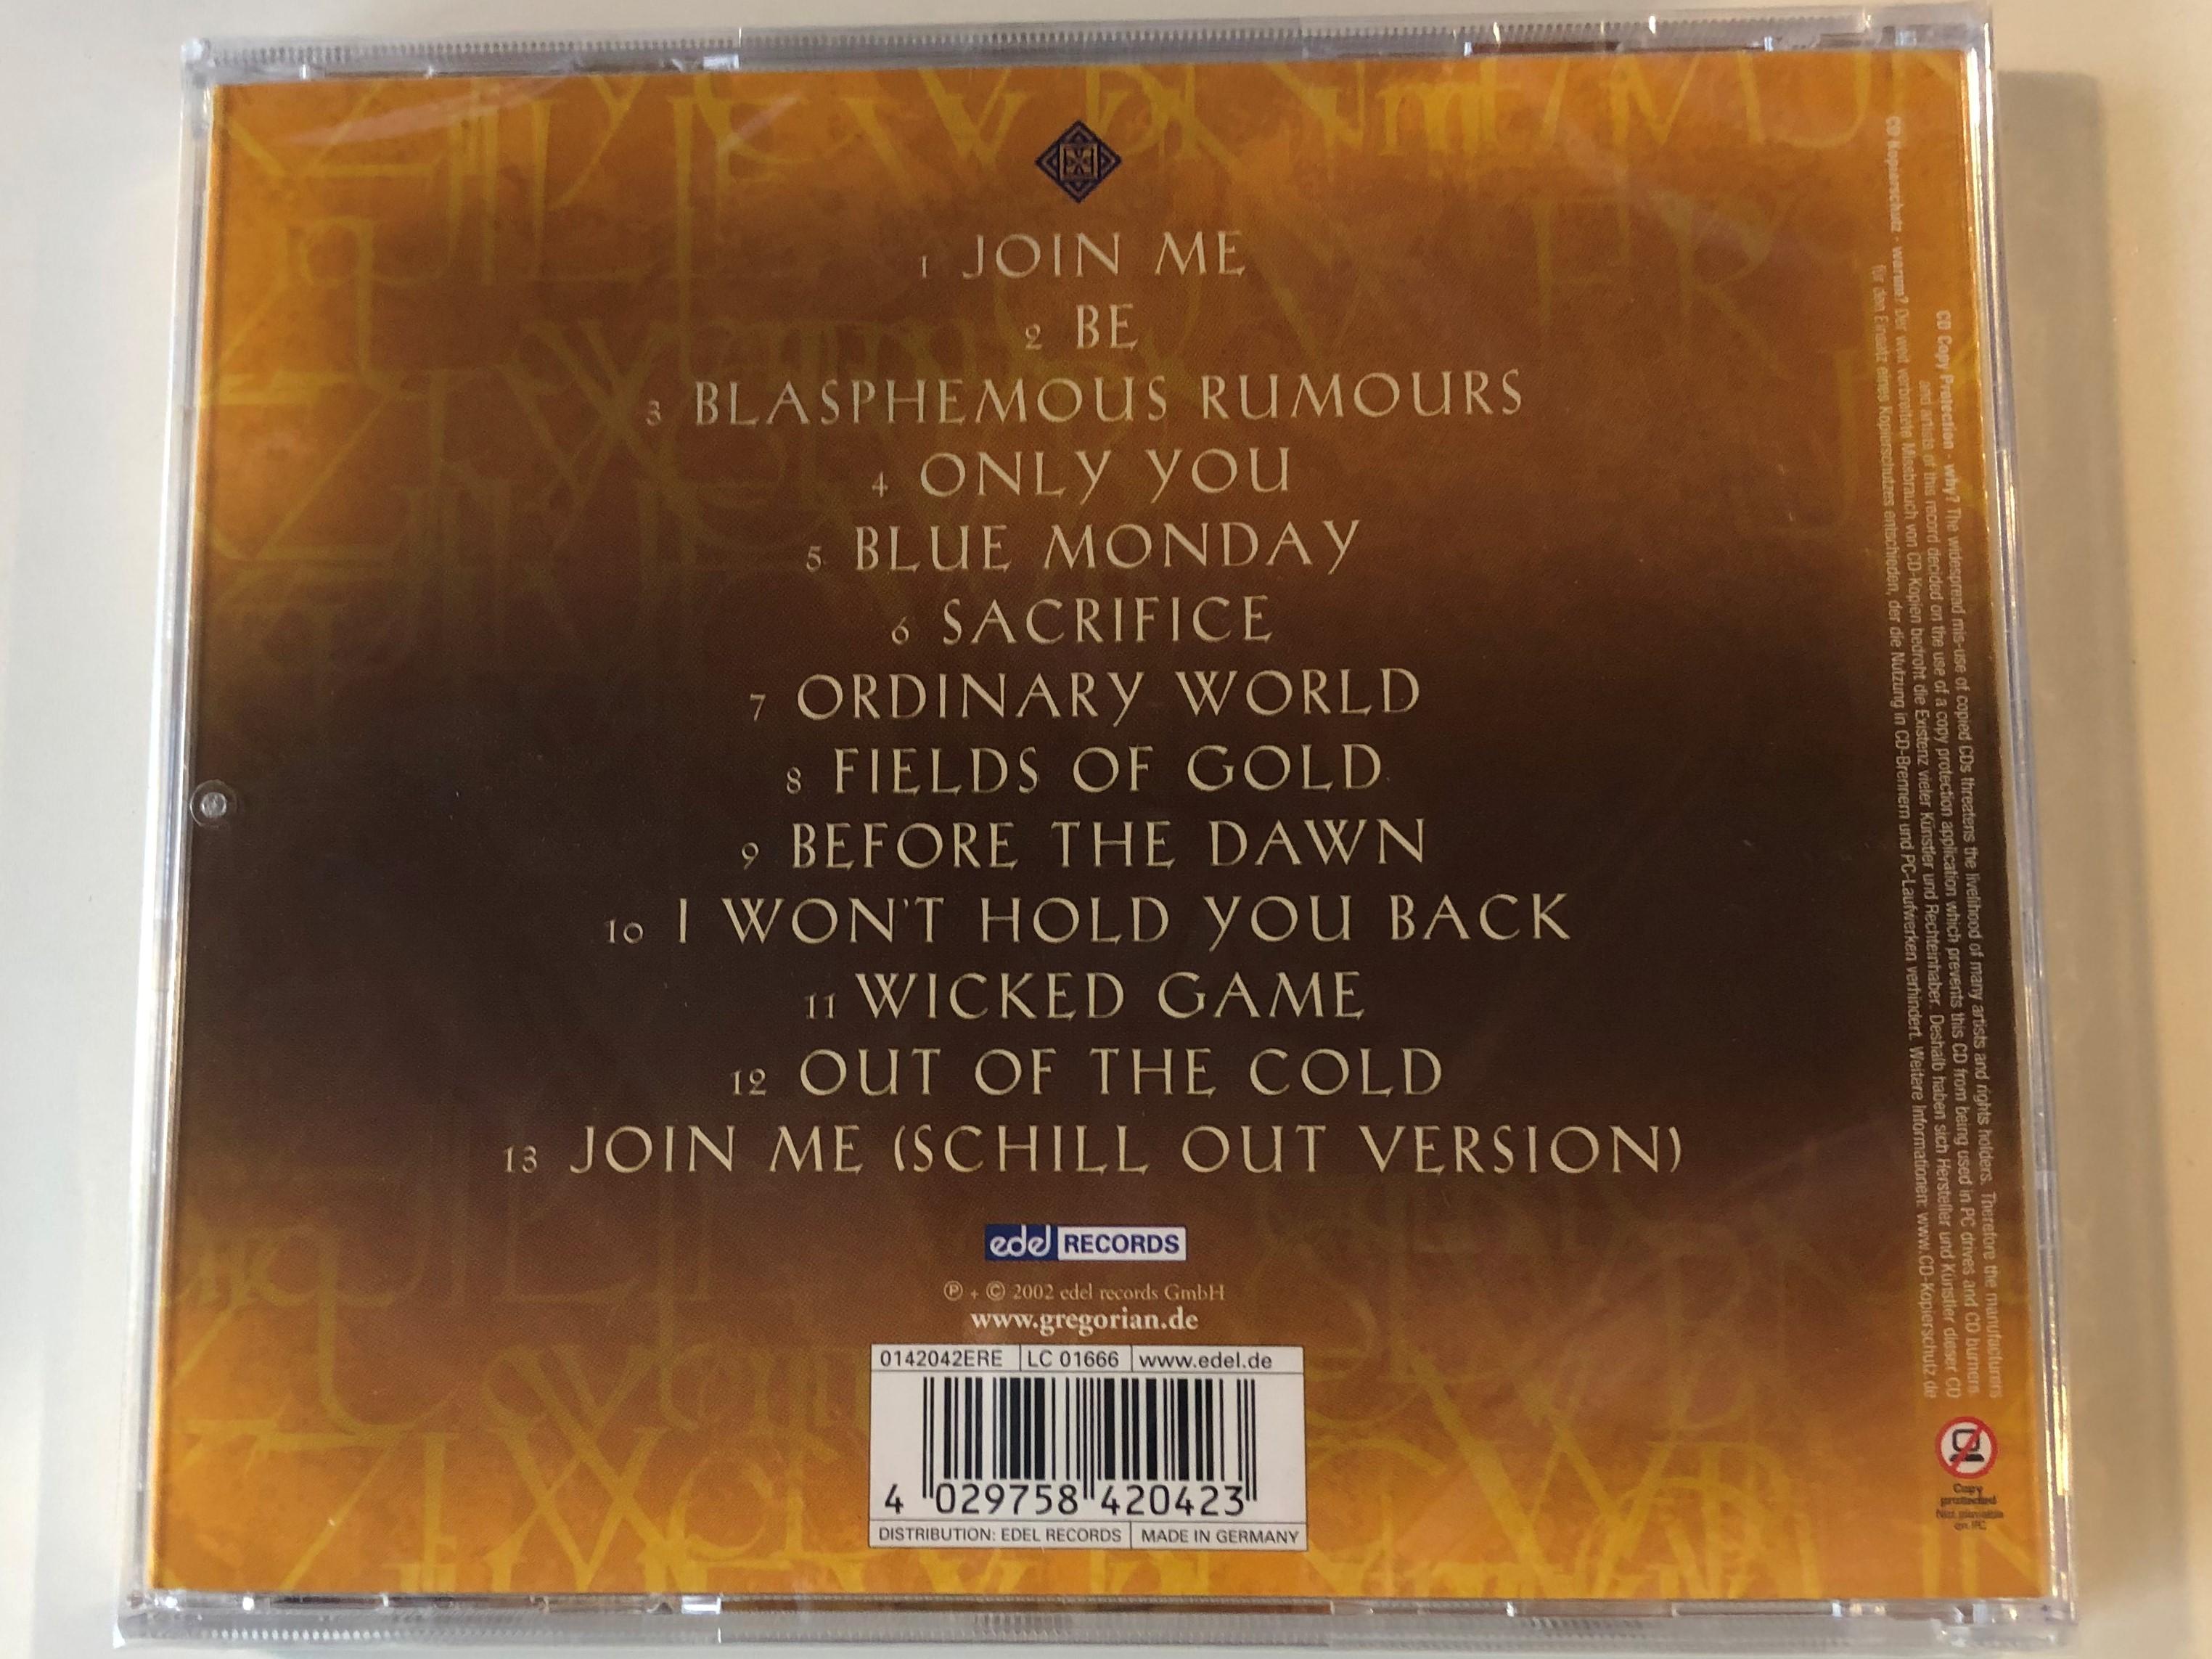 gregorian-masters-of-chant-chapter-iii-edel-records-audio-cd-2002-0142042ere-2-.jpg